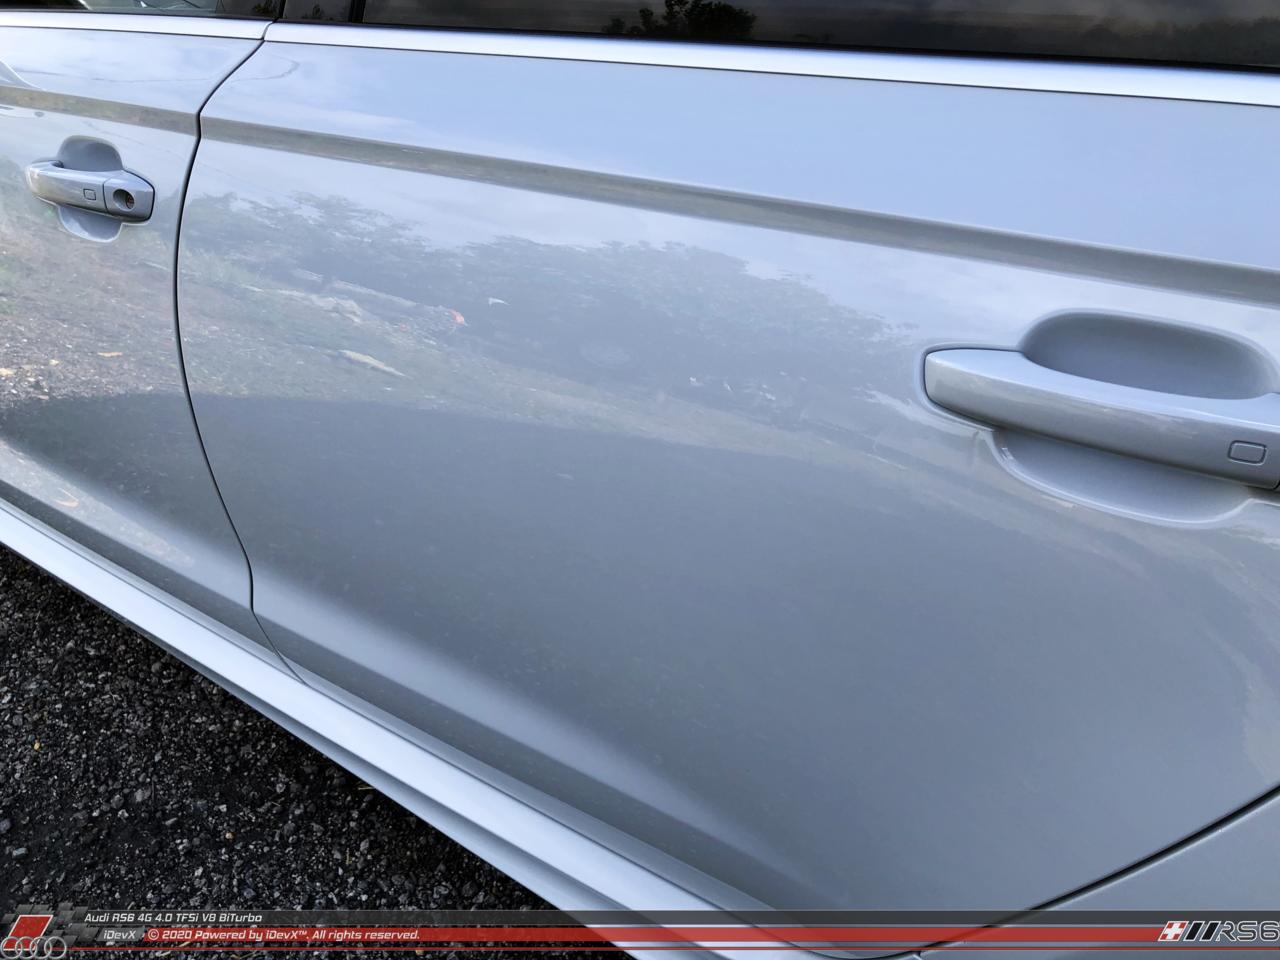 05_08.2019_Audi-RS6_iDevX_041.png